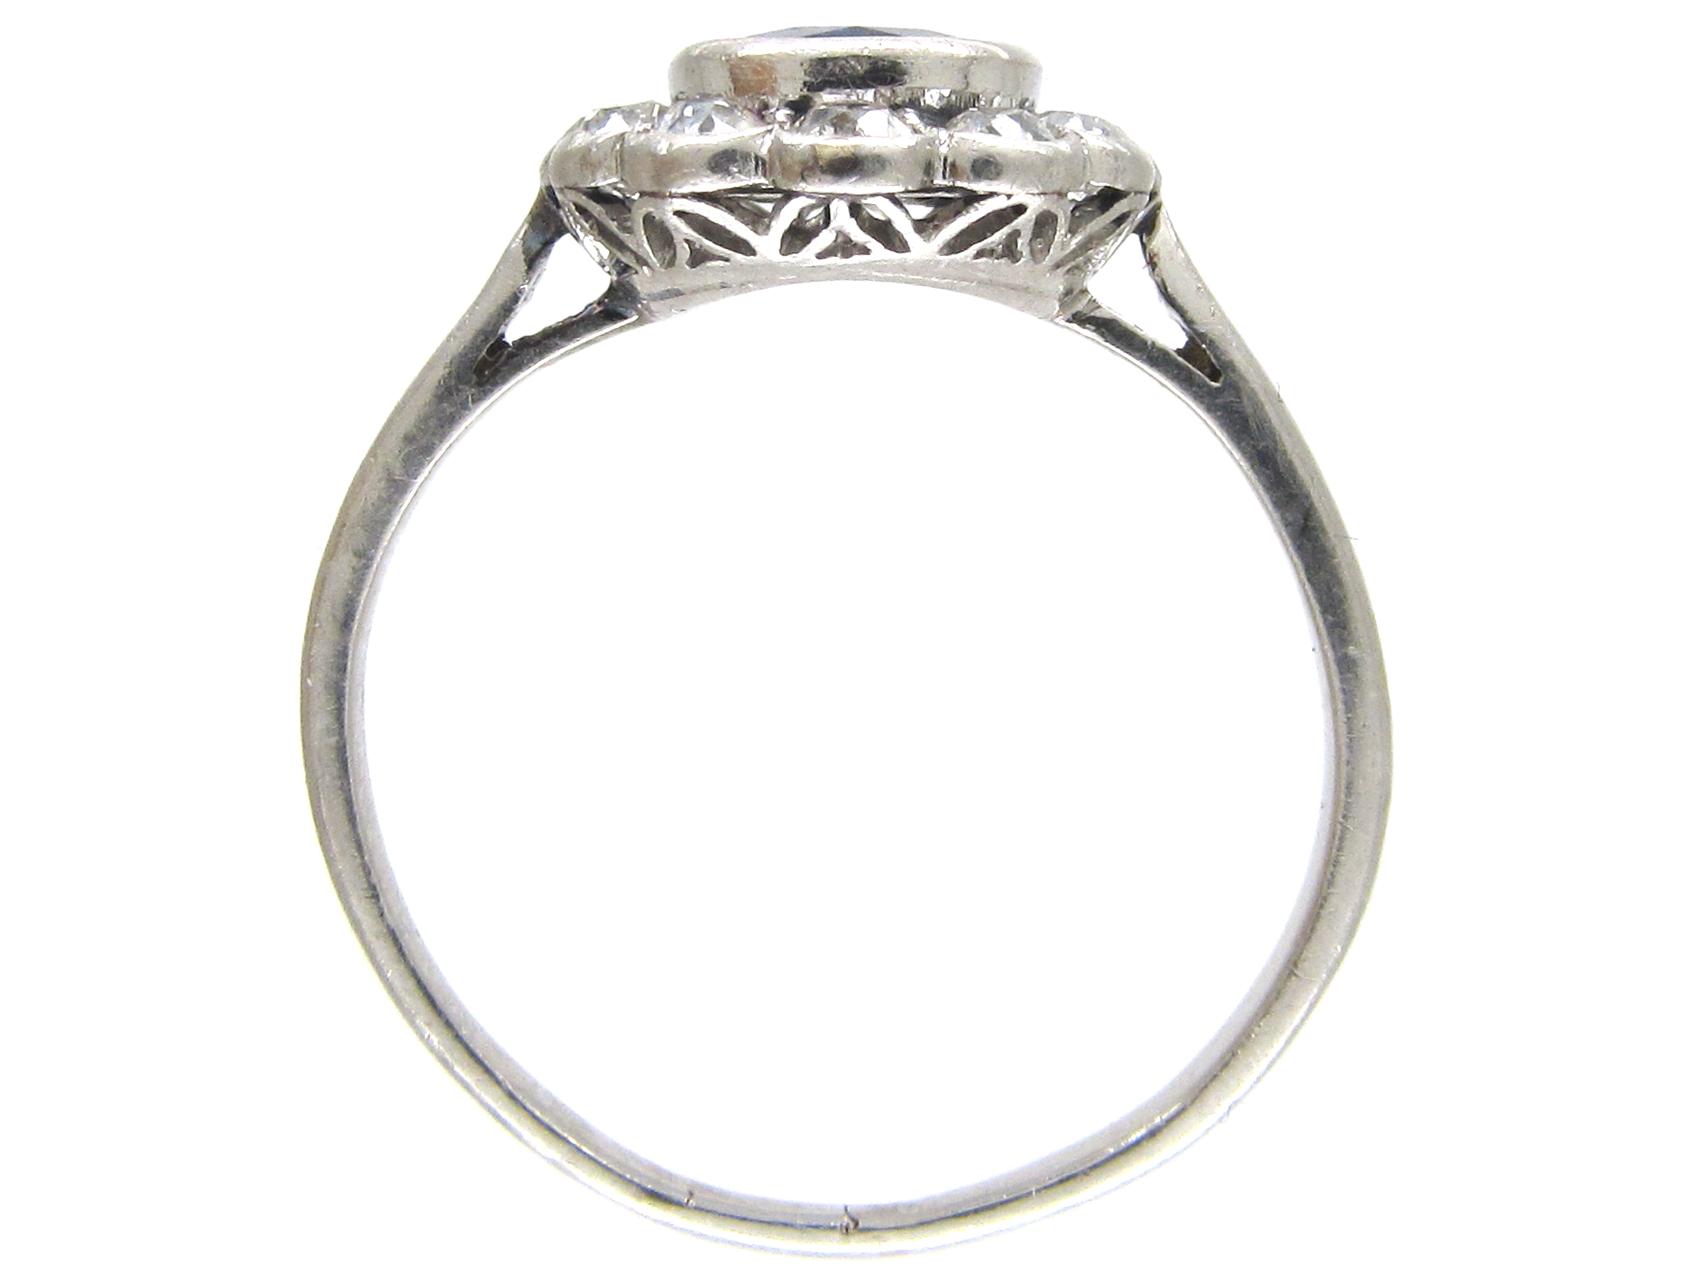 Edwardian Sapphire & Diamond Oval Cluster Ring